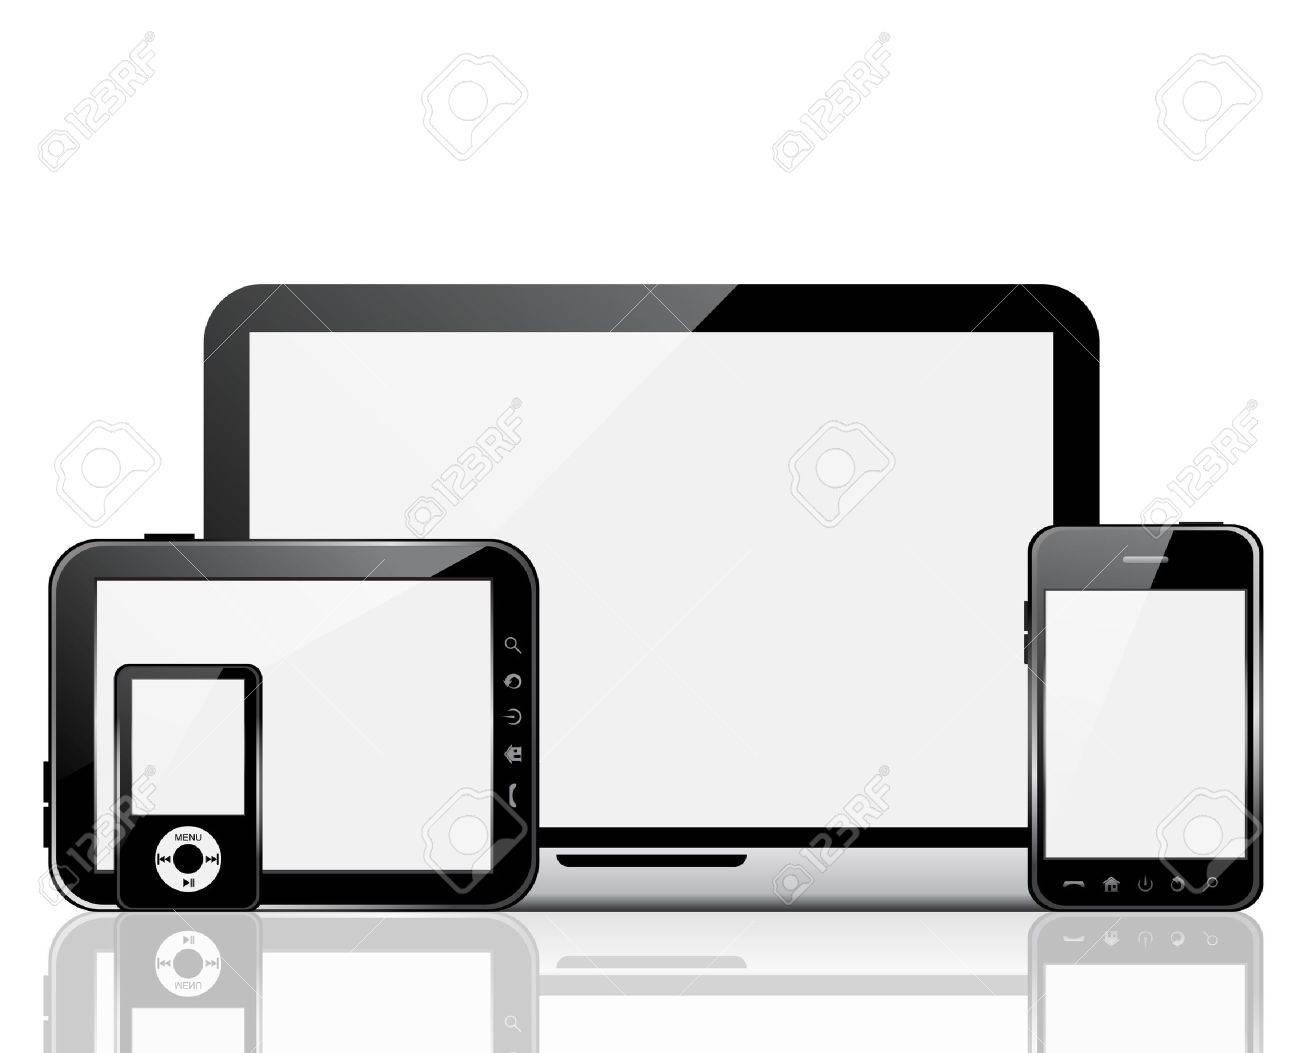 Gadgets Stock Vector - 14979815